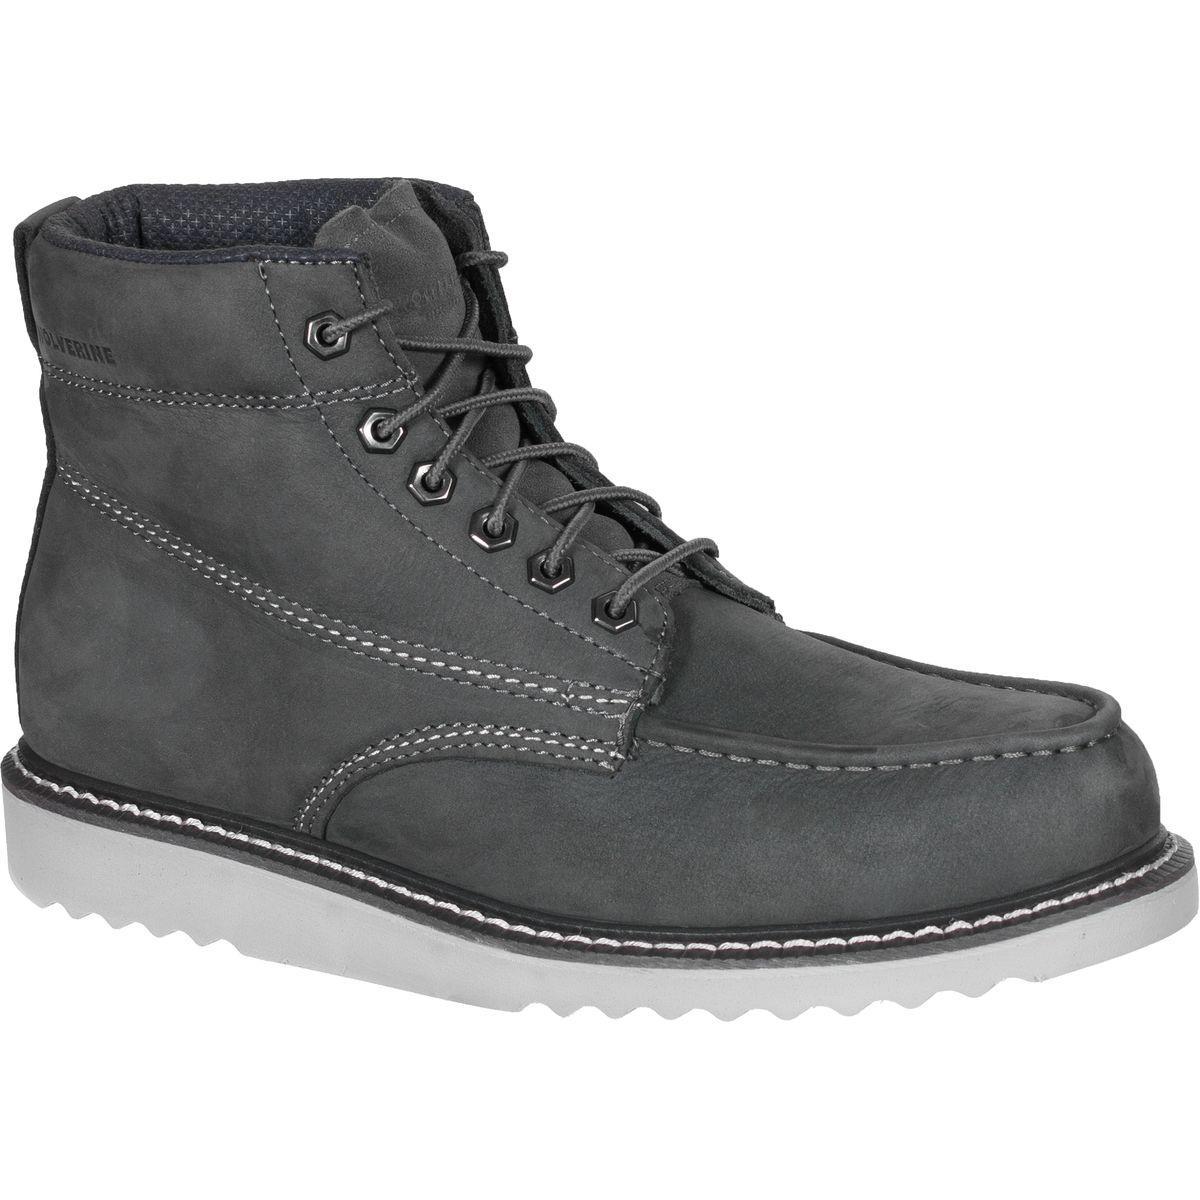 44ffca5d072 Wolverine Gray Ranger Moc Toe Boot for men